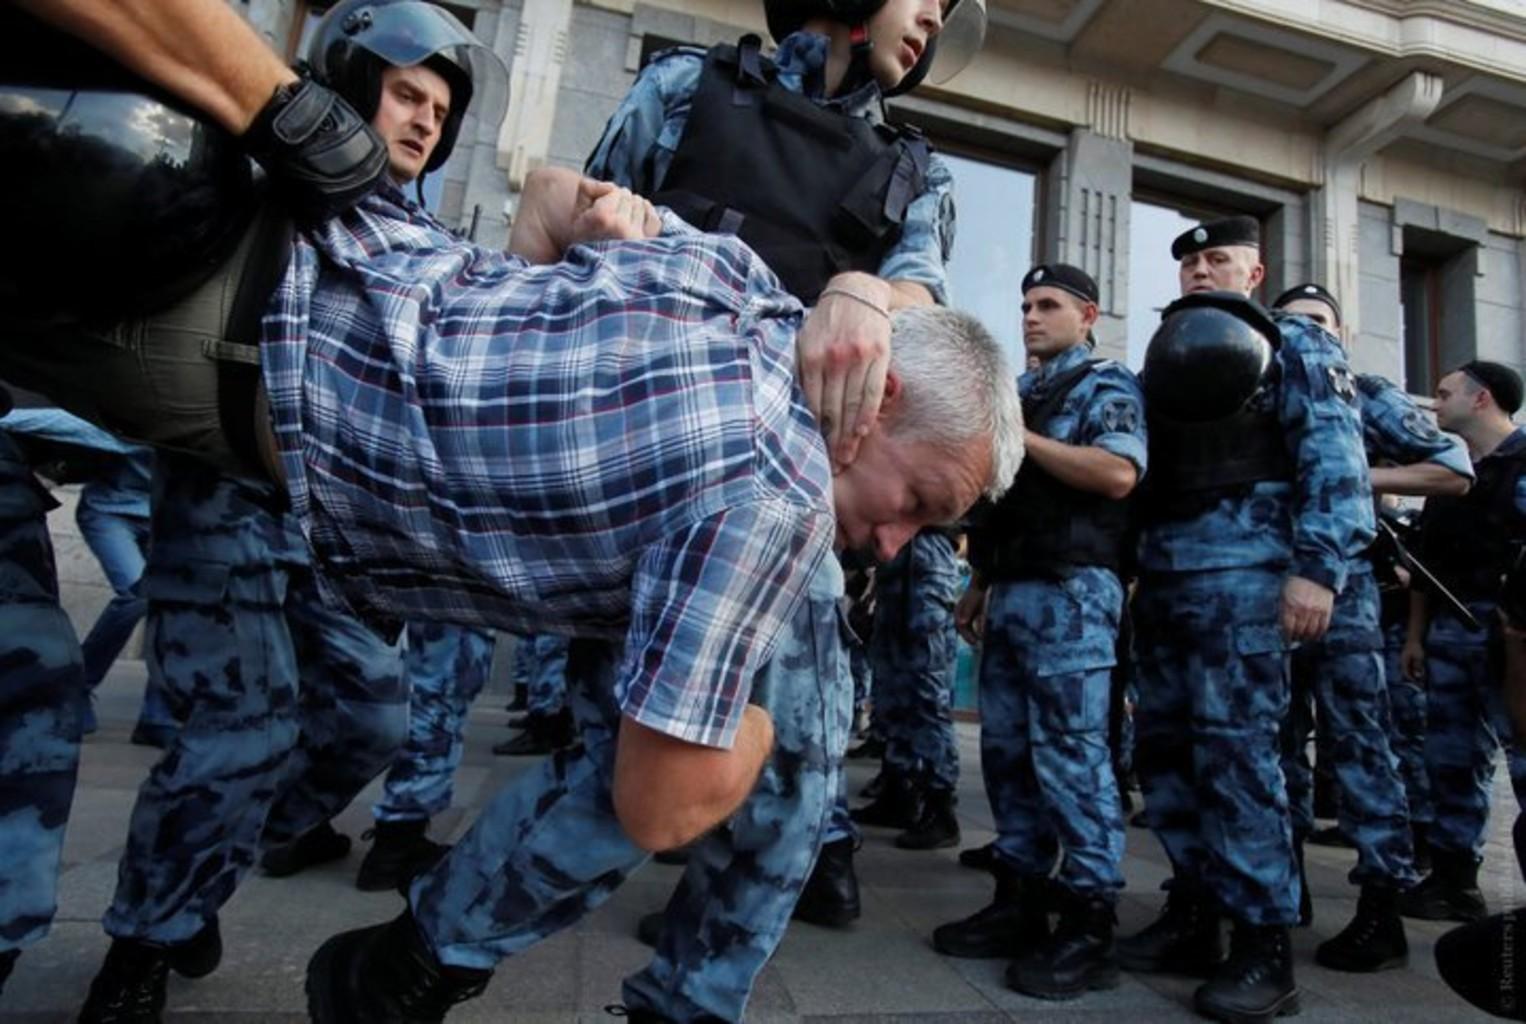 Moskva akciya protesta 27072019 11